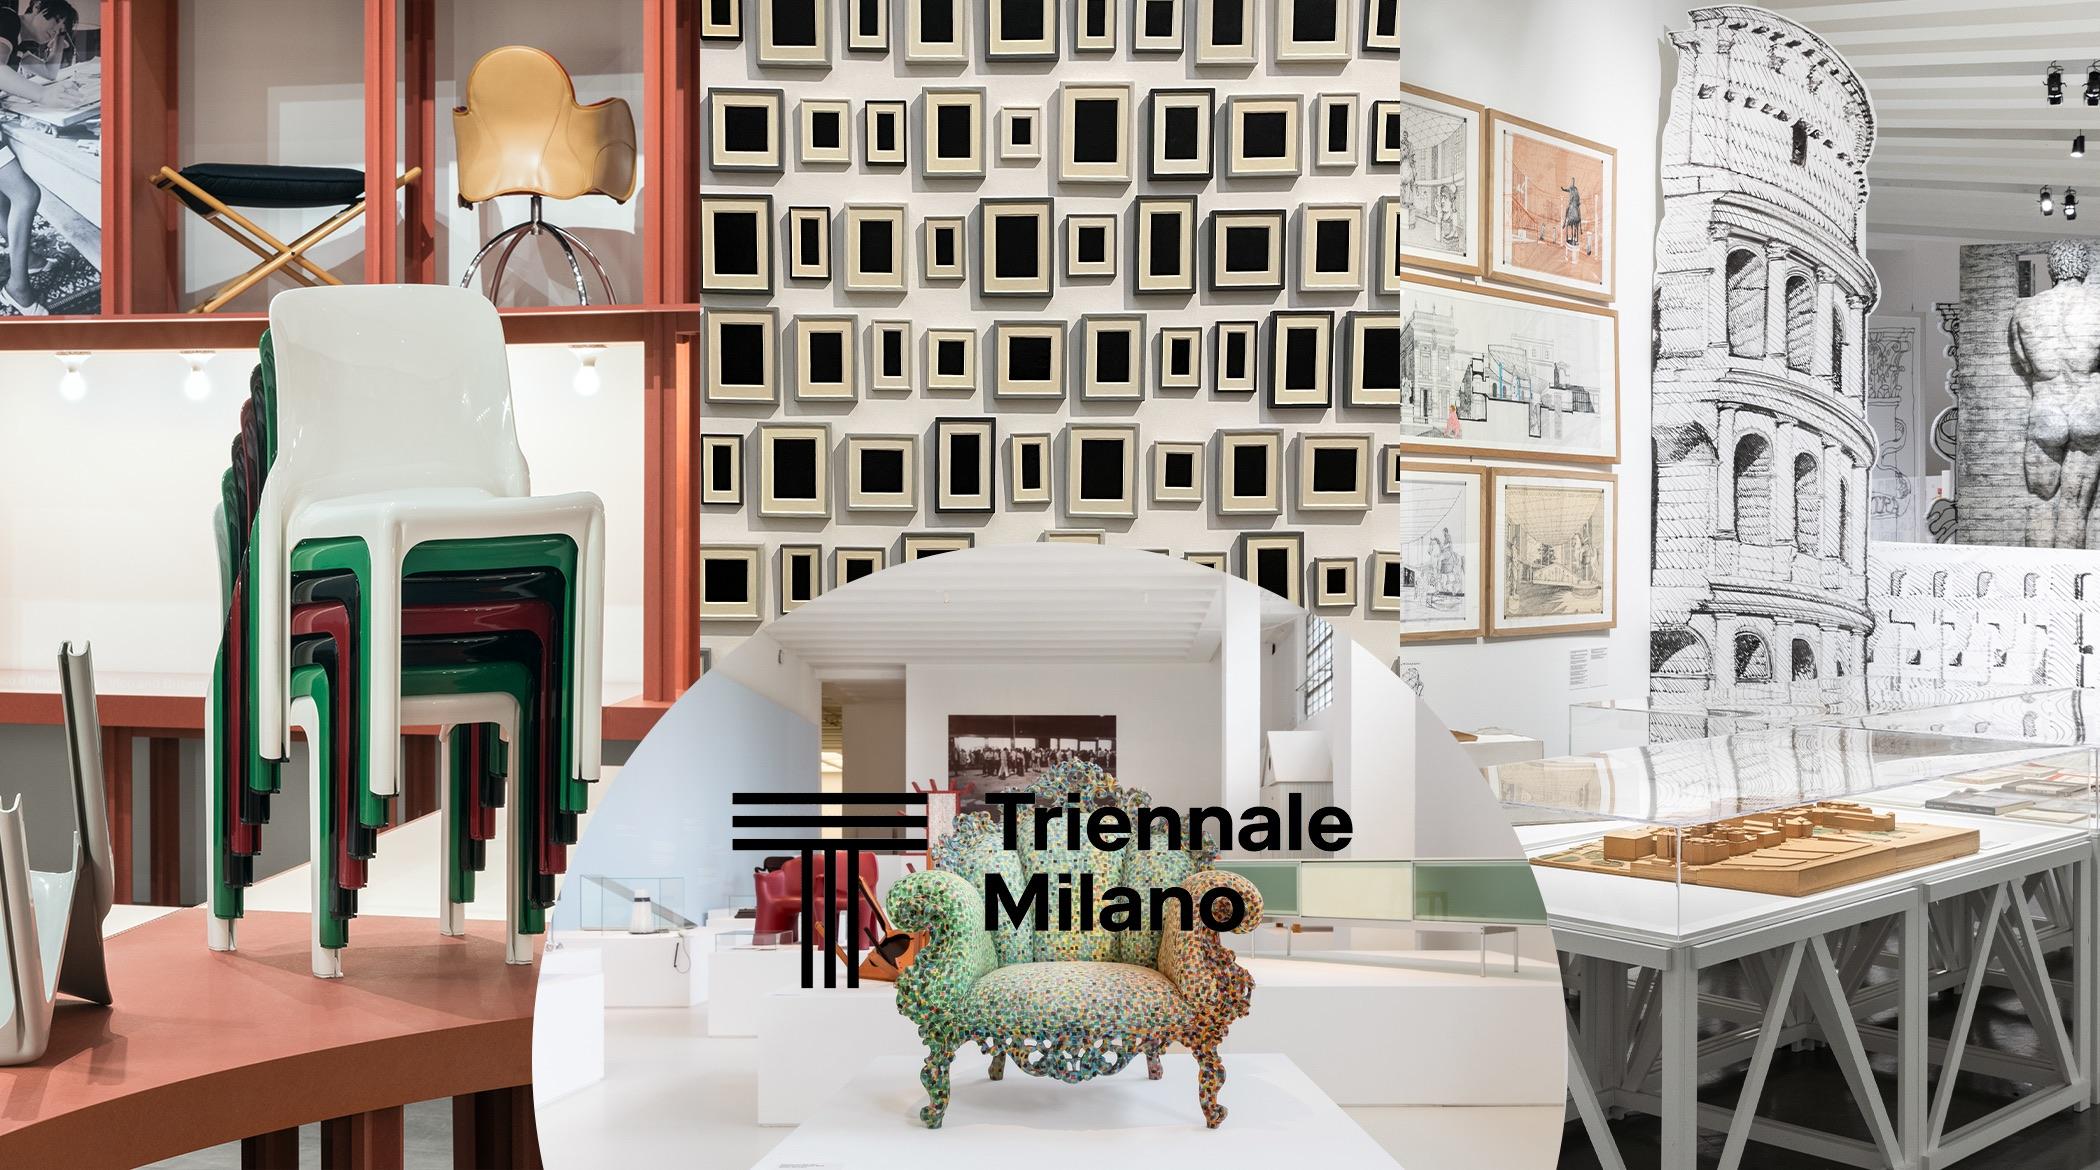 Riapertura Triennale; Milano; Mostre; Magistretti; Les Citoyens; Aymonino